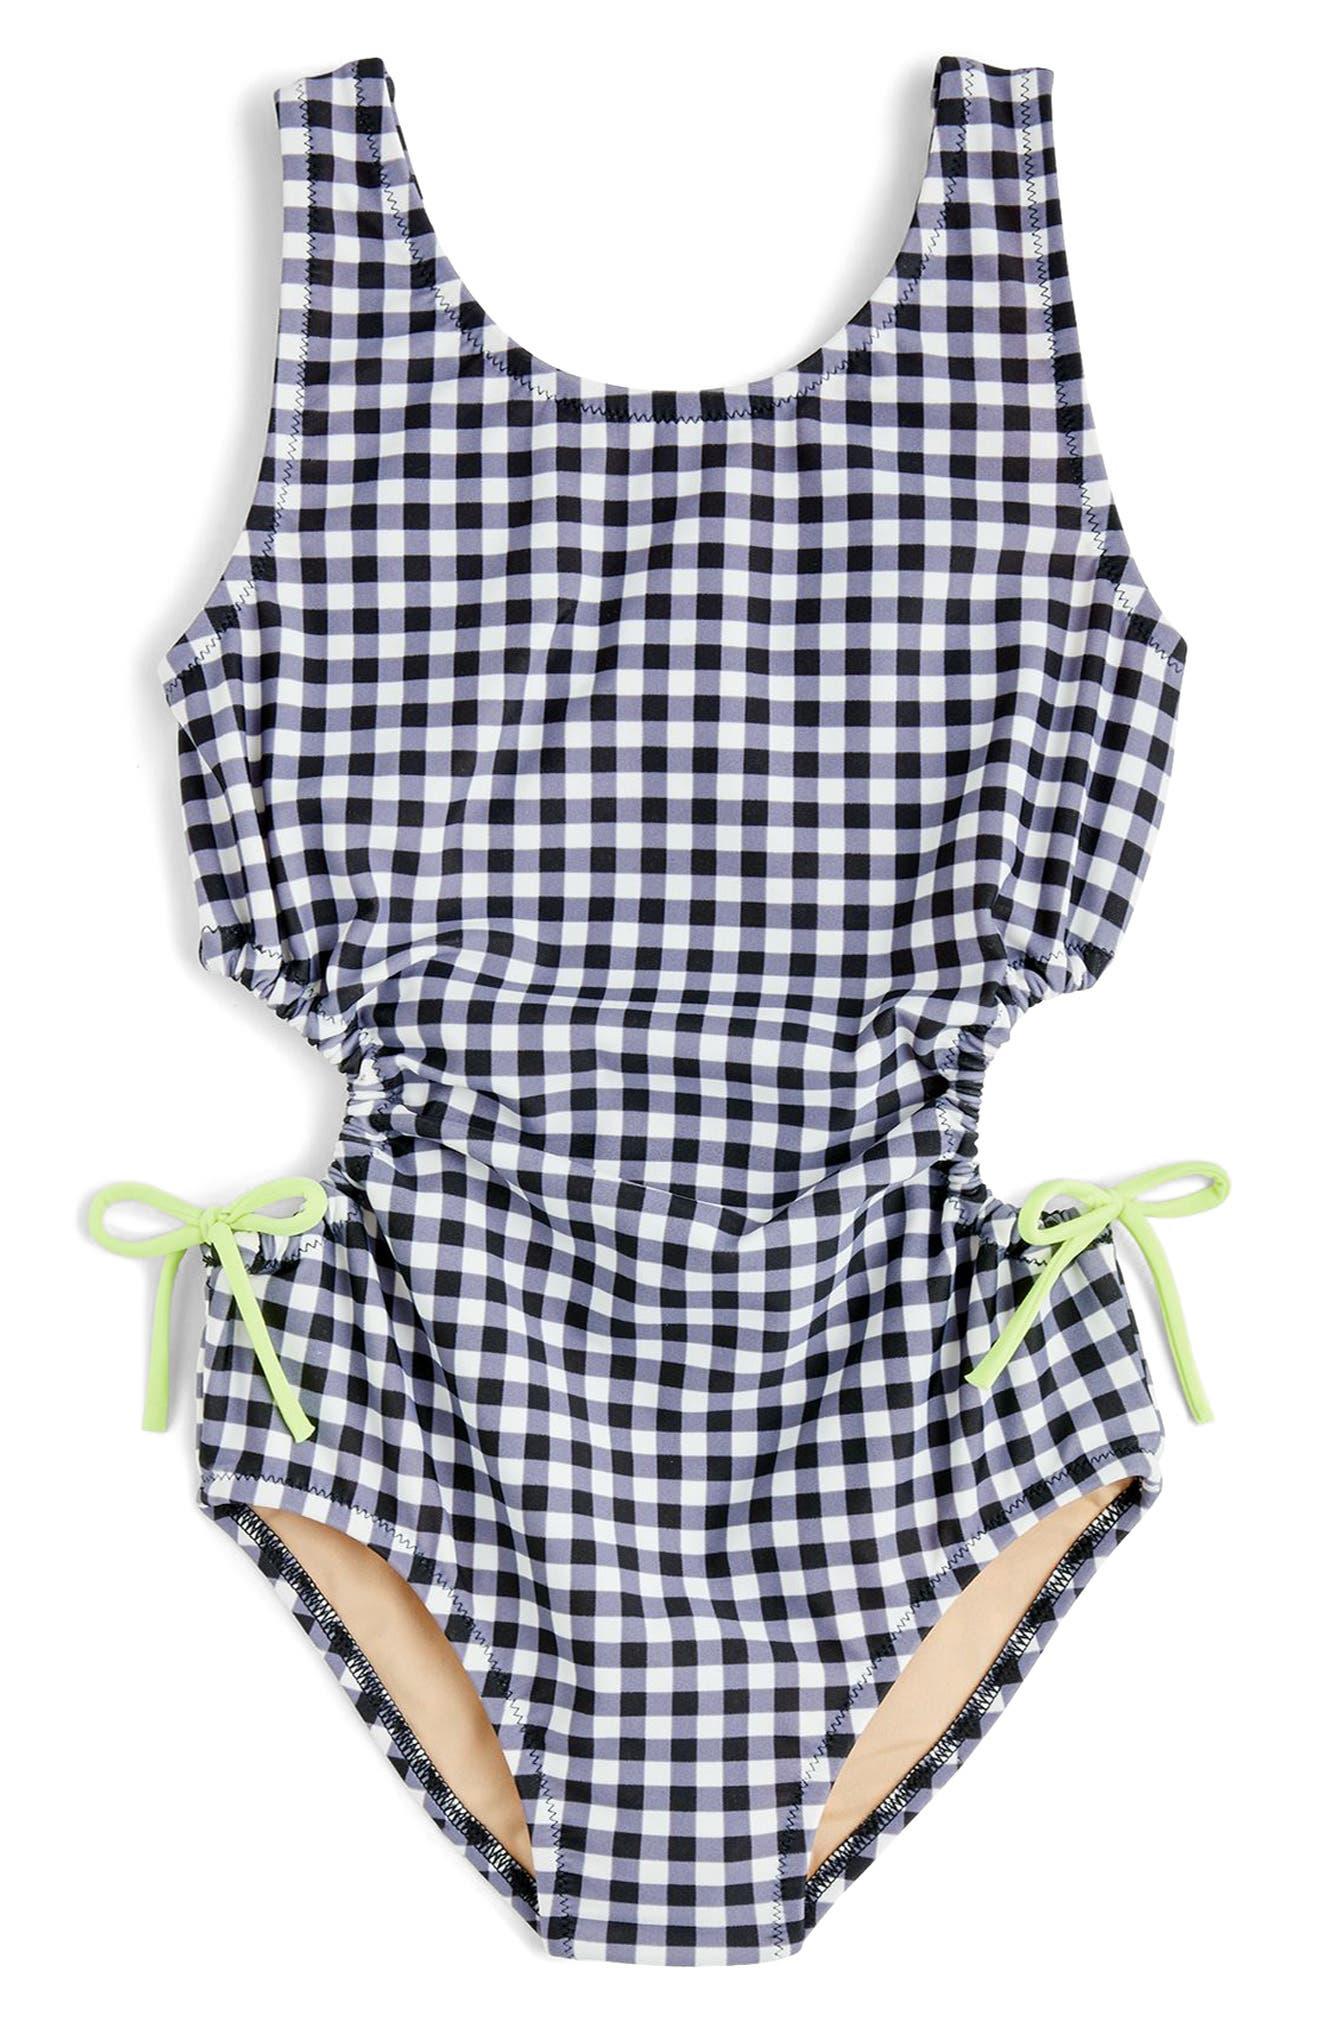 Clara Gingham One-Piece Swimsuit,                             Main thumbnail 1, color,                             Black White Multi